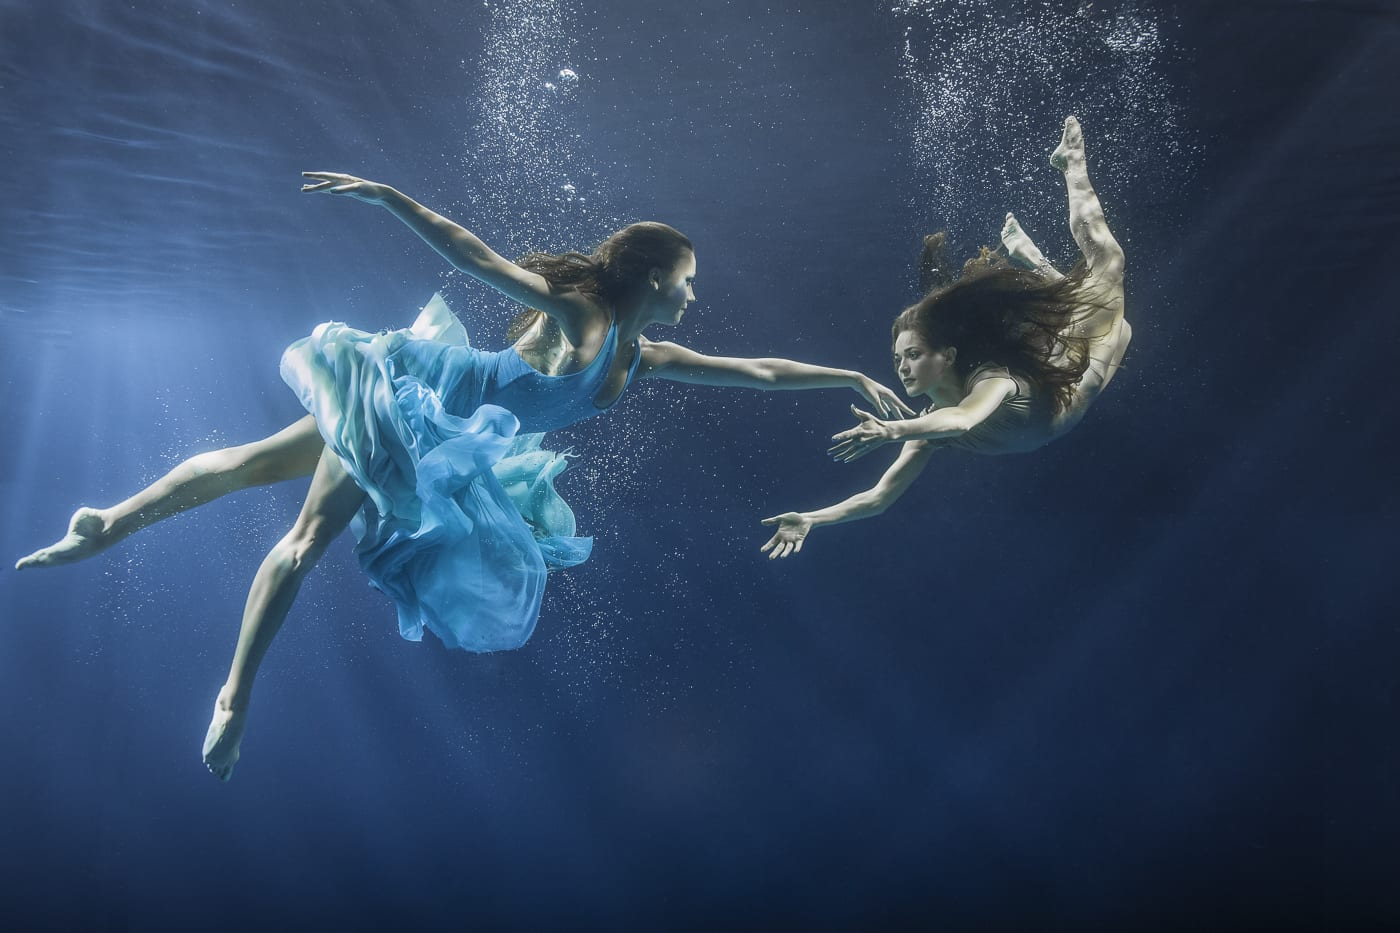 Maya Almeida, Underwater Dance Series, 2014